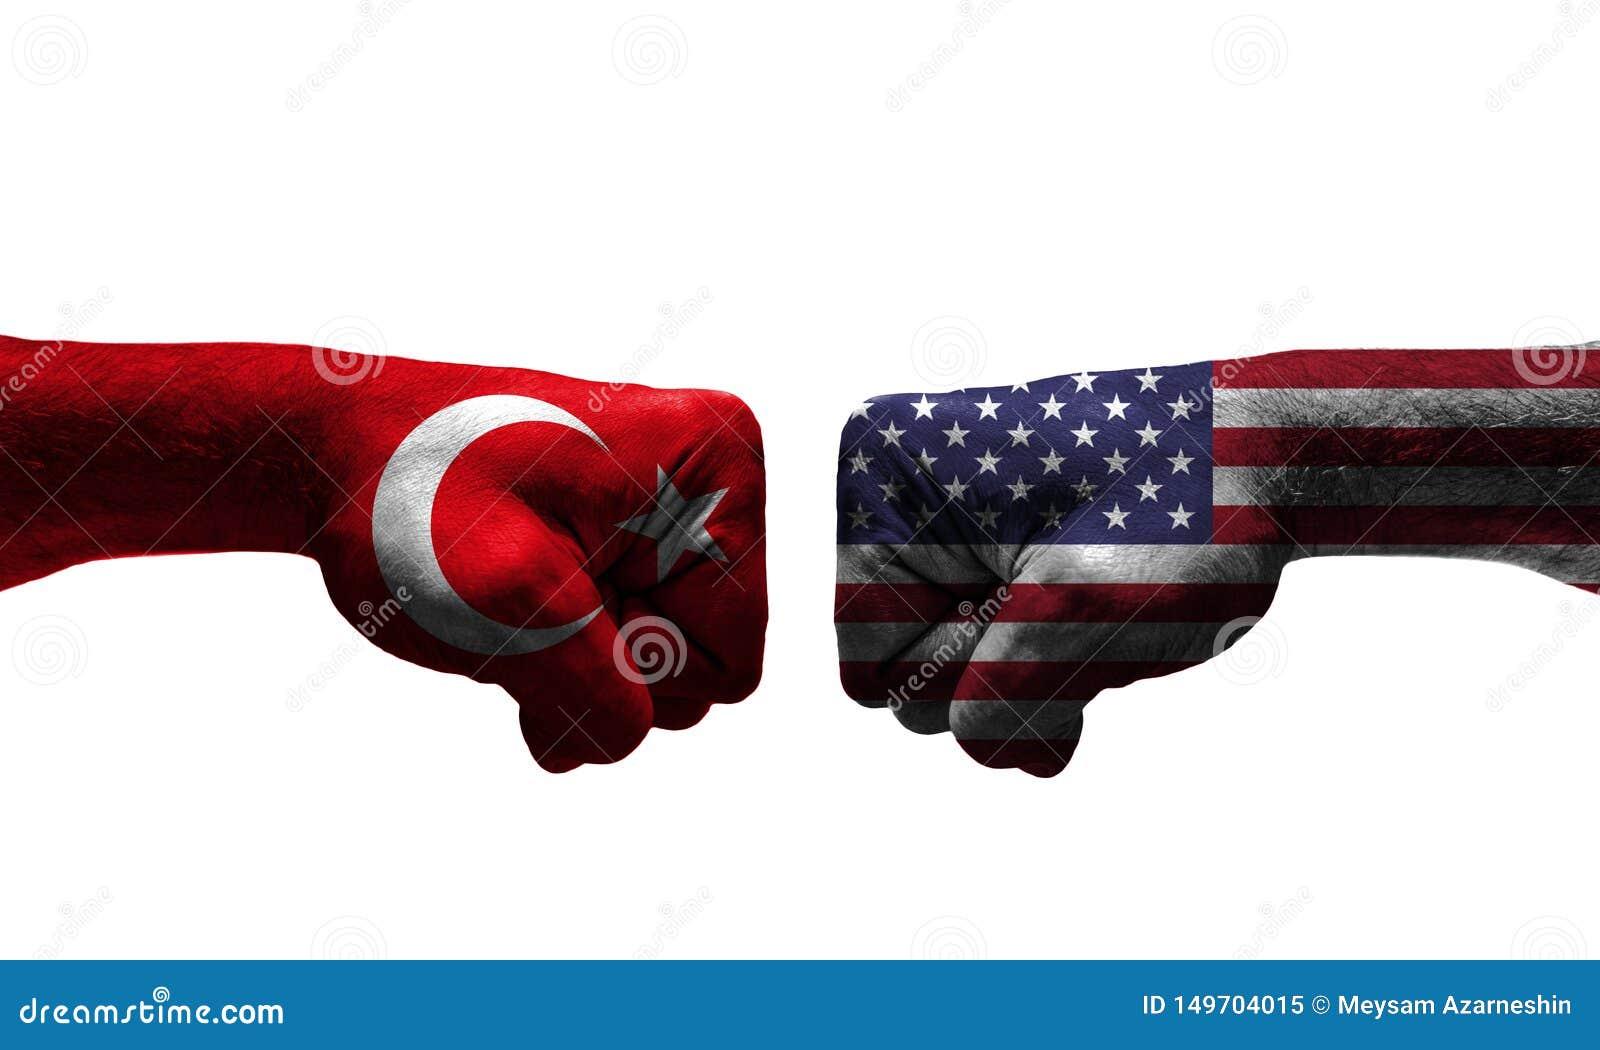 Война между 2 странами